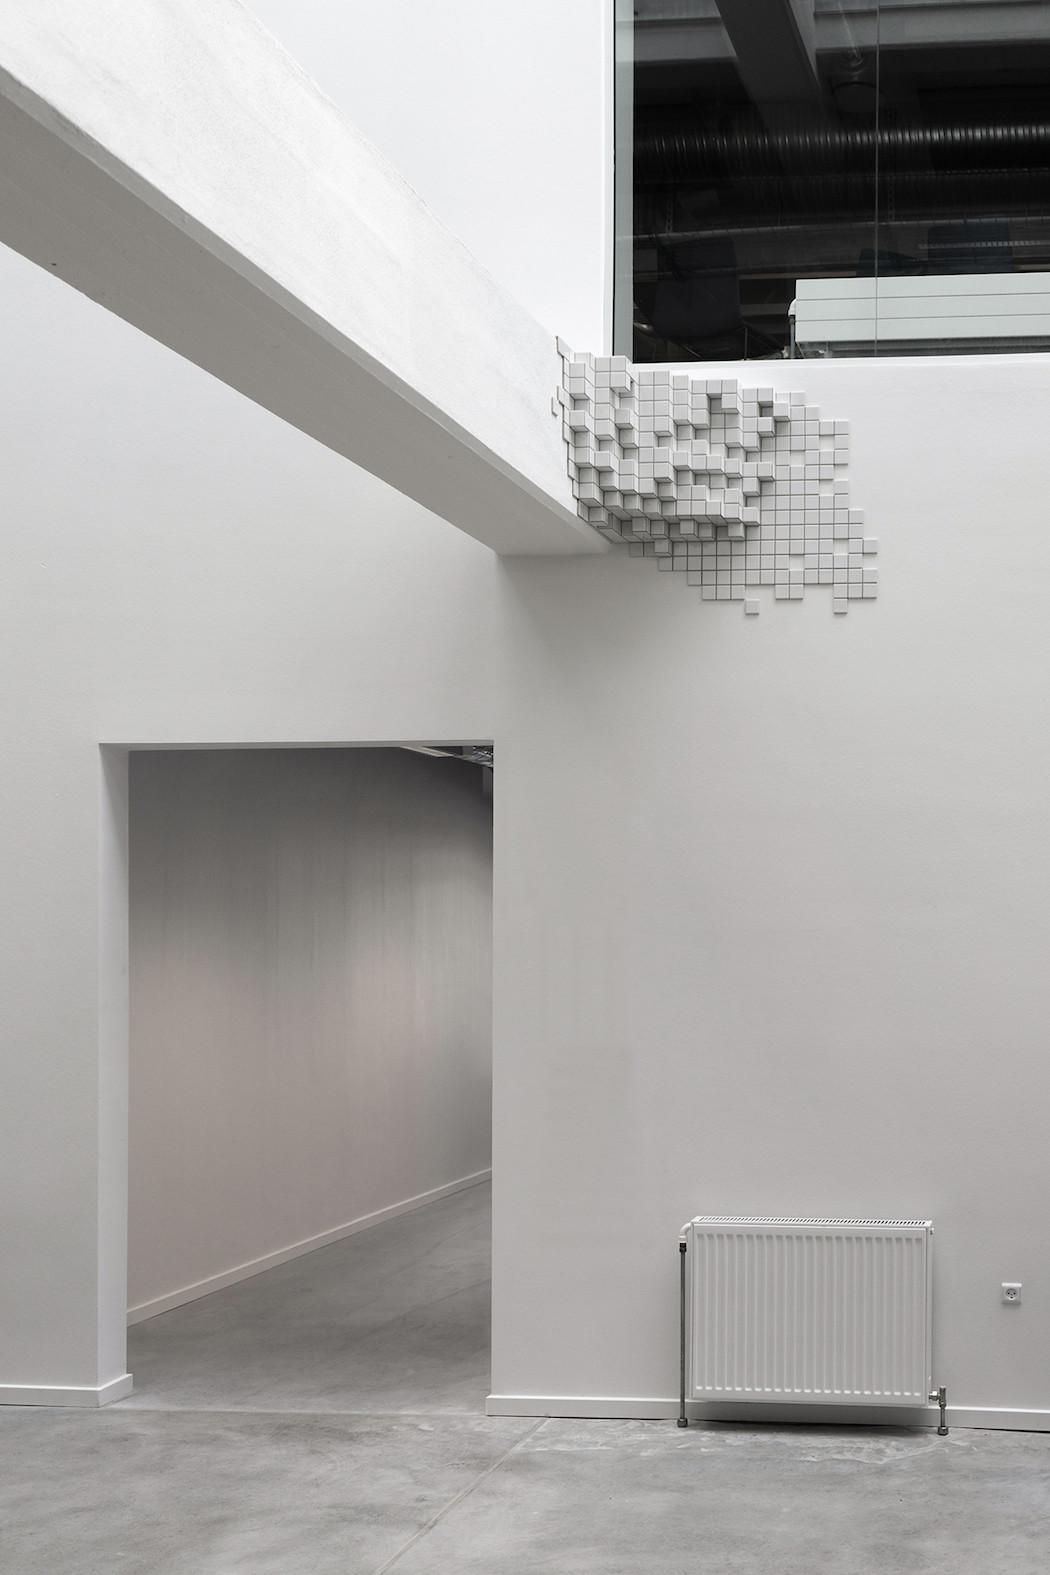 art_borgmannlenk_mos_installation_13-1050x1575